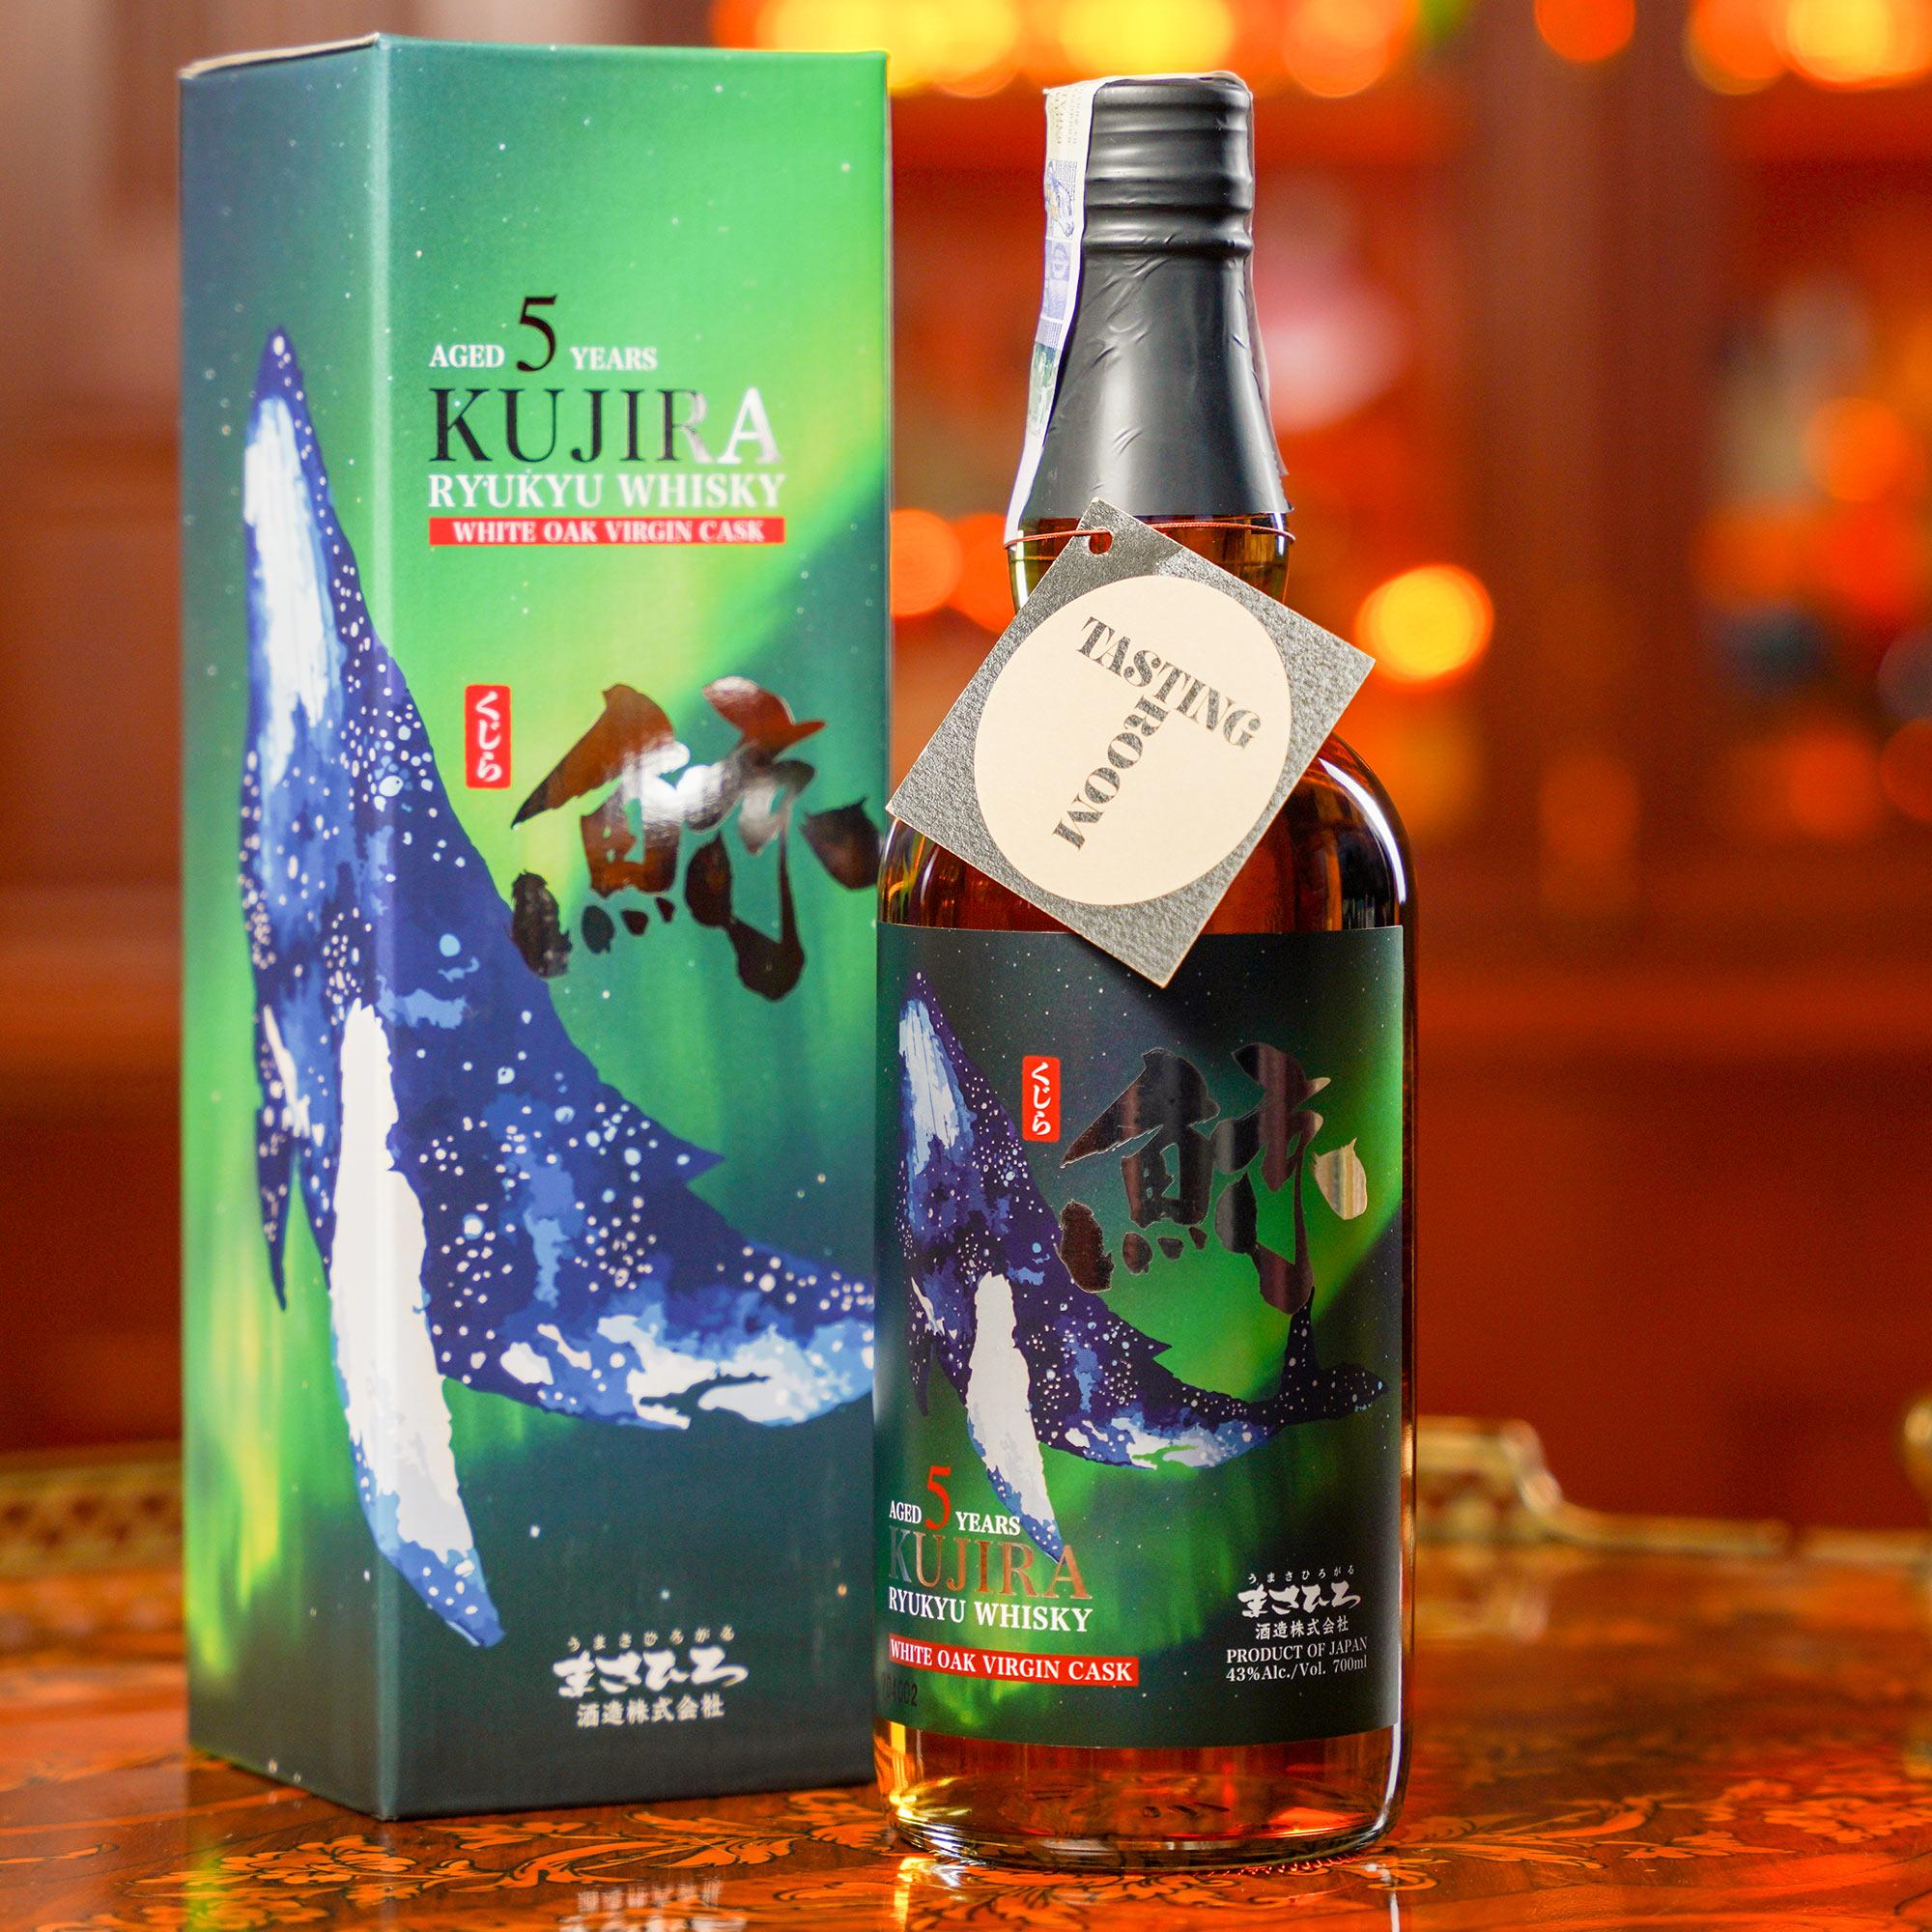 Kujira Ryukyo Whisky 5 YO /Куджира Уиски 5 годишно